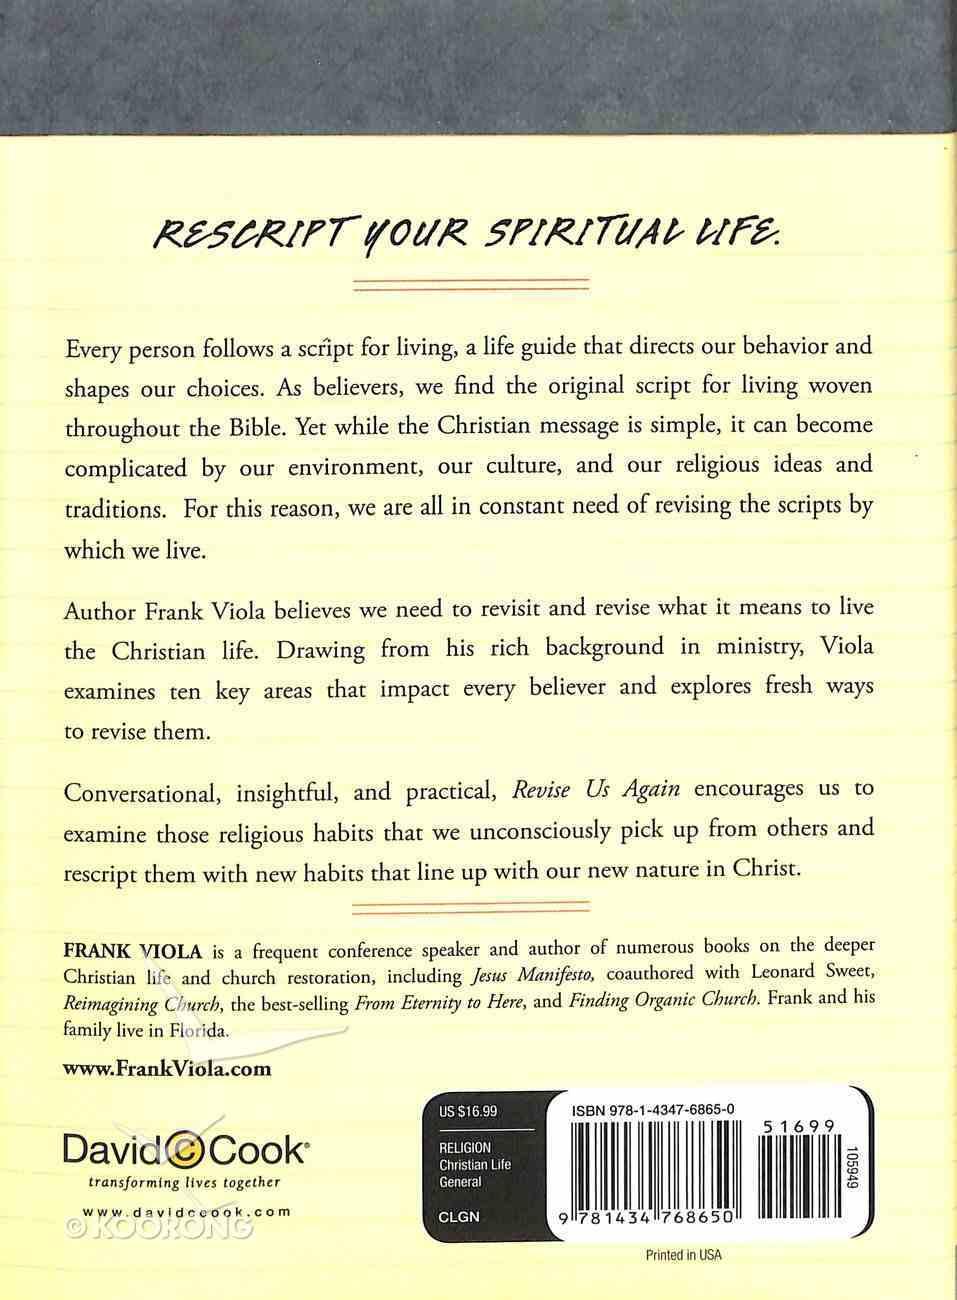 Frank Viola's Jesus Life 4-Pack (4 Vols) Pack